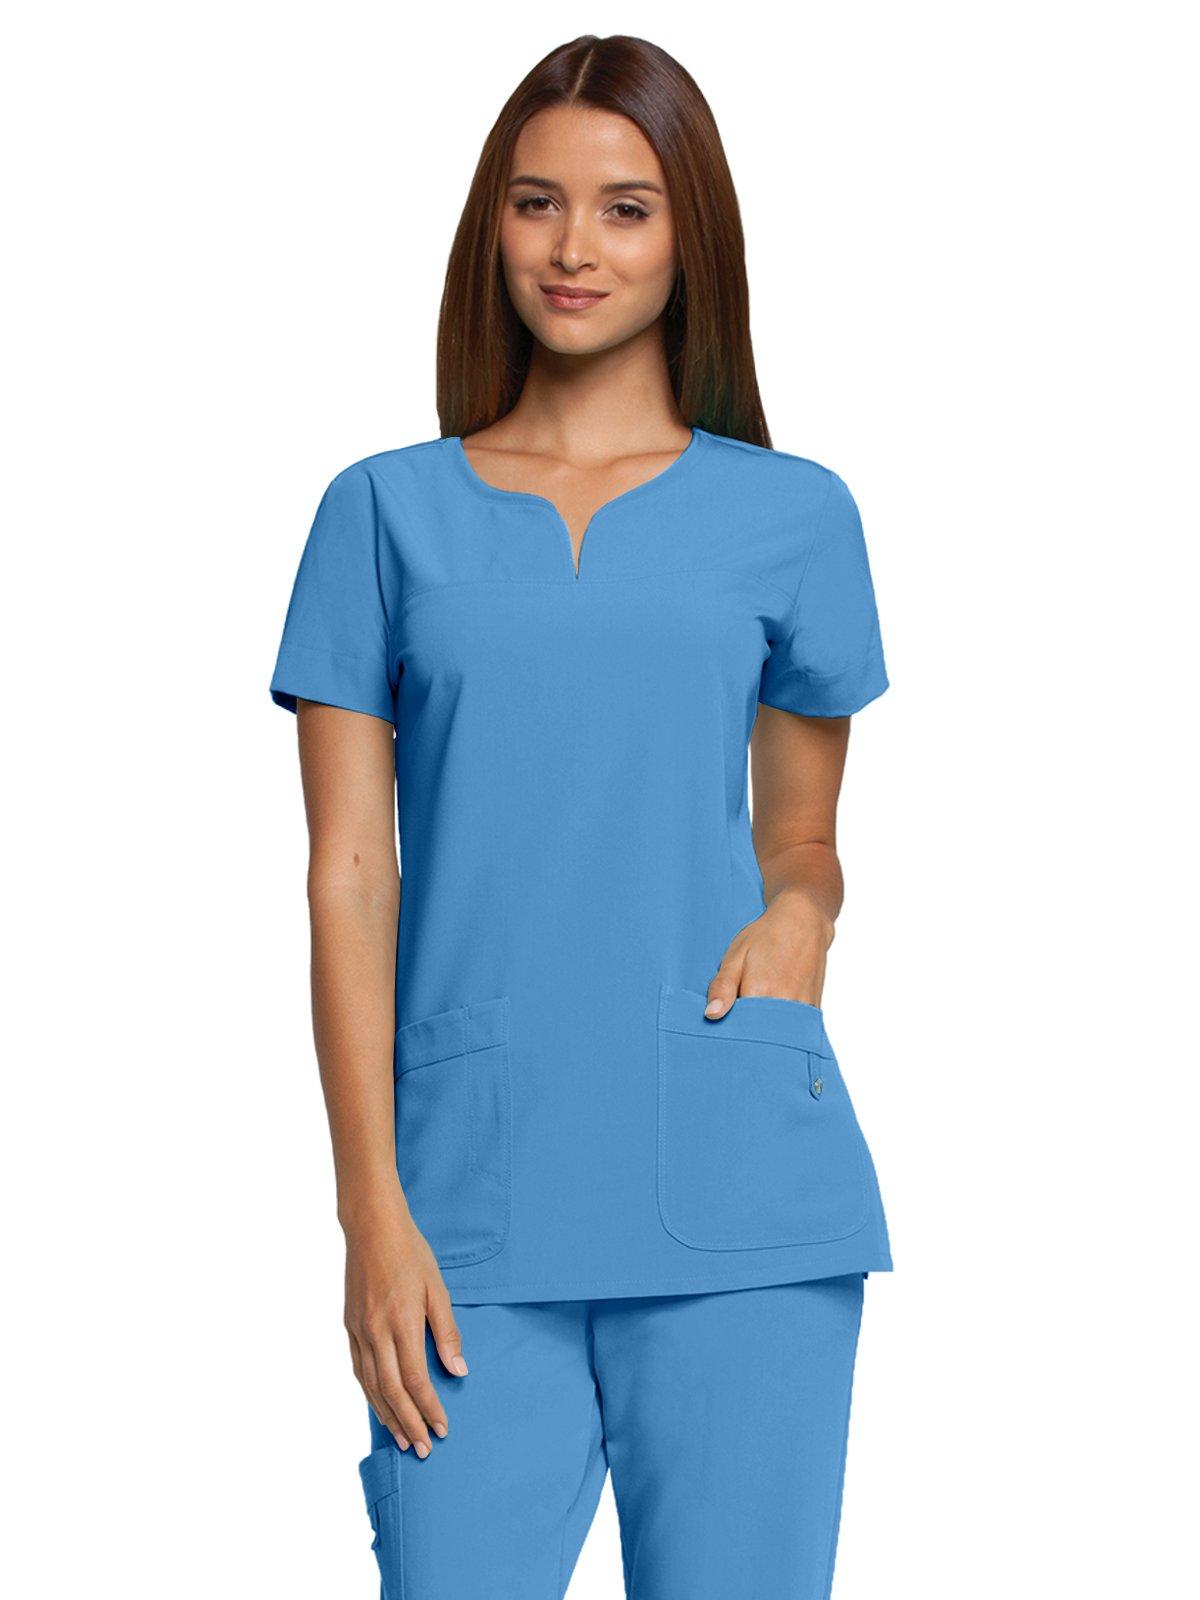 Grey's Anatomy Signature 2121 Notch Neck Top Ciel Blue XXS